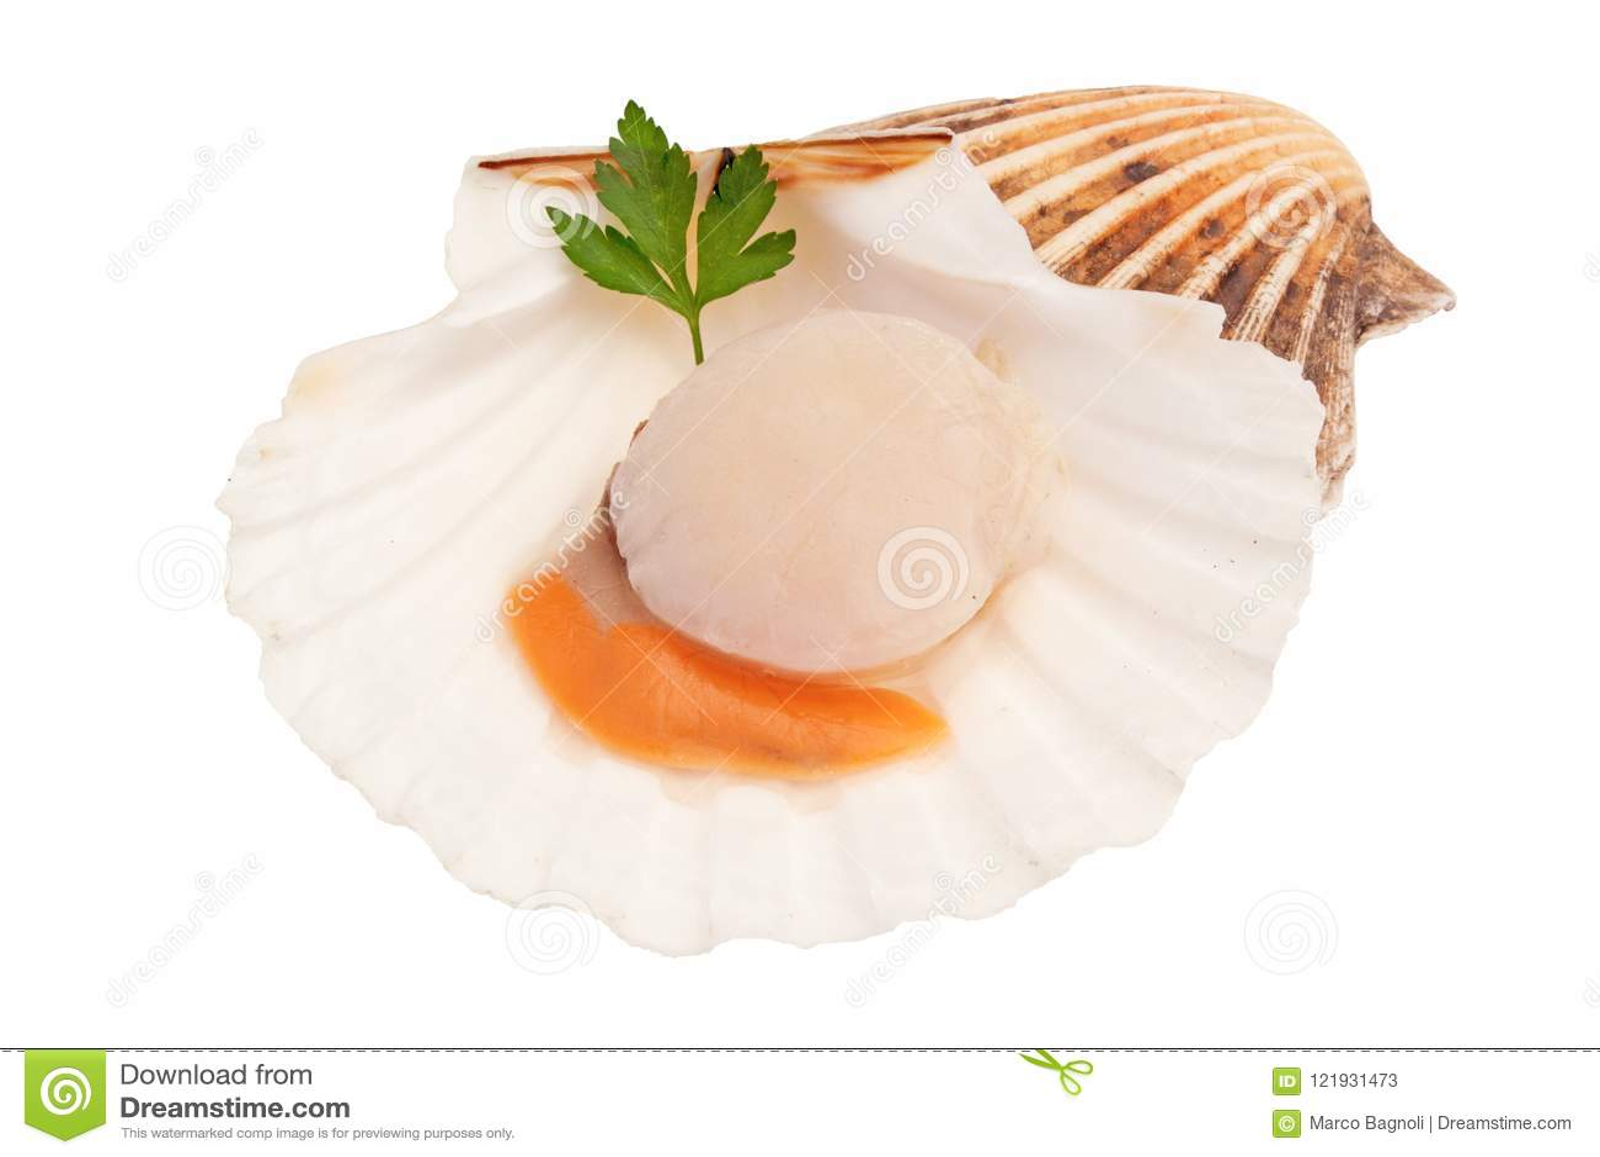 Isolerad ny rå kammussla - skaldjur